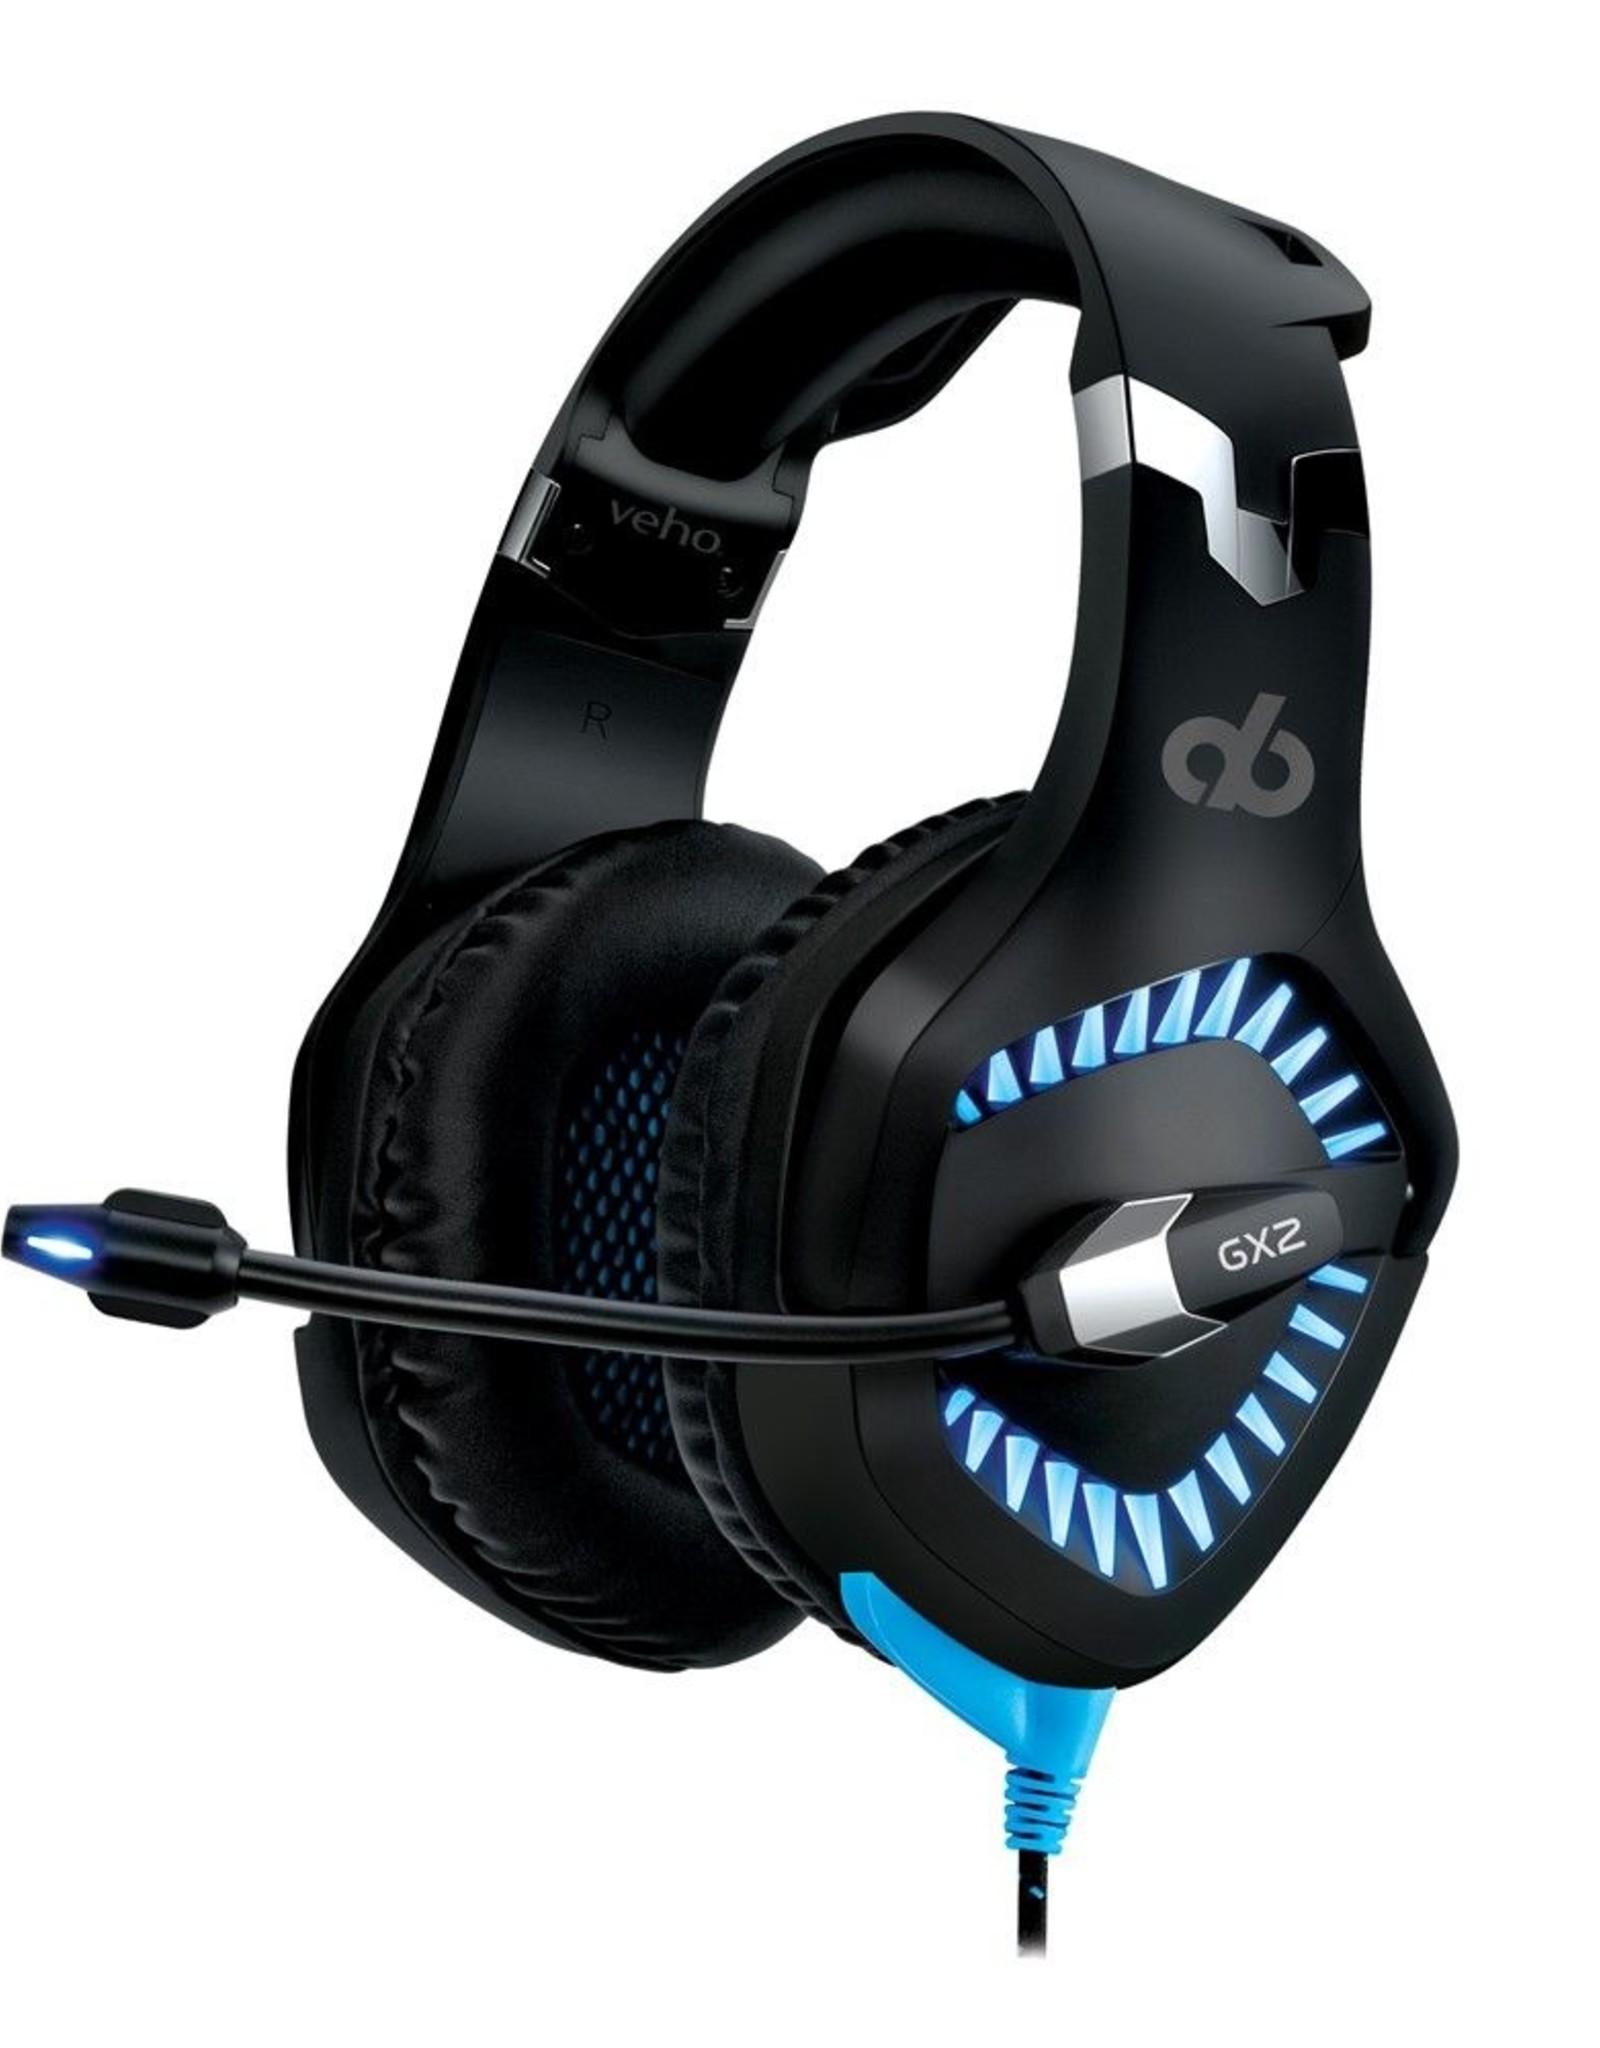 Veho Veho Alpha Bravo GX-2 Gaming Headset with UBU 7.1 Surround Sound